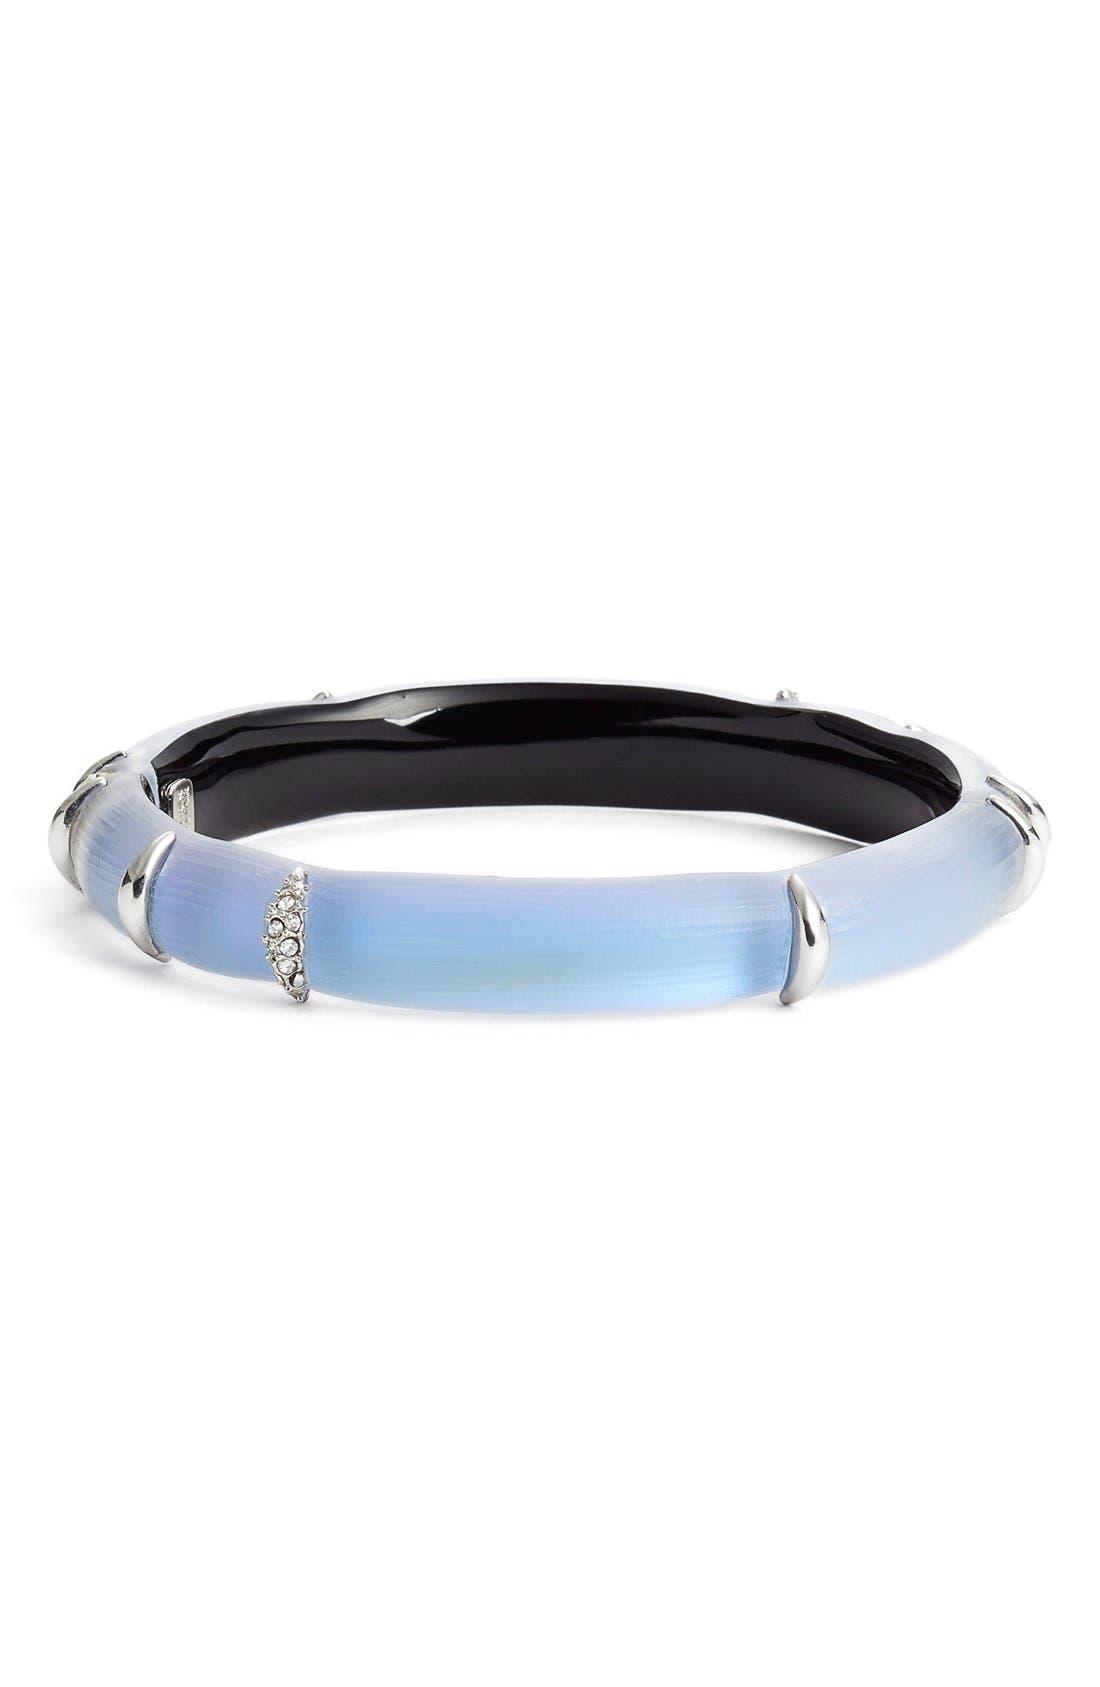 Alternate Image 1 Selected - Alexis Bittar'Lucite® - Liquid Stripe' Bangle Bracelet